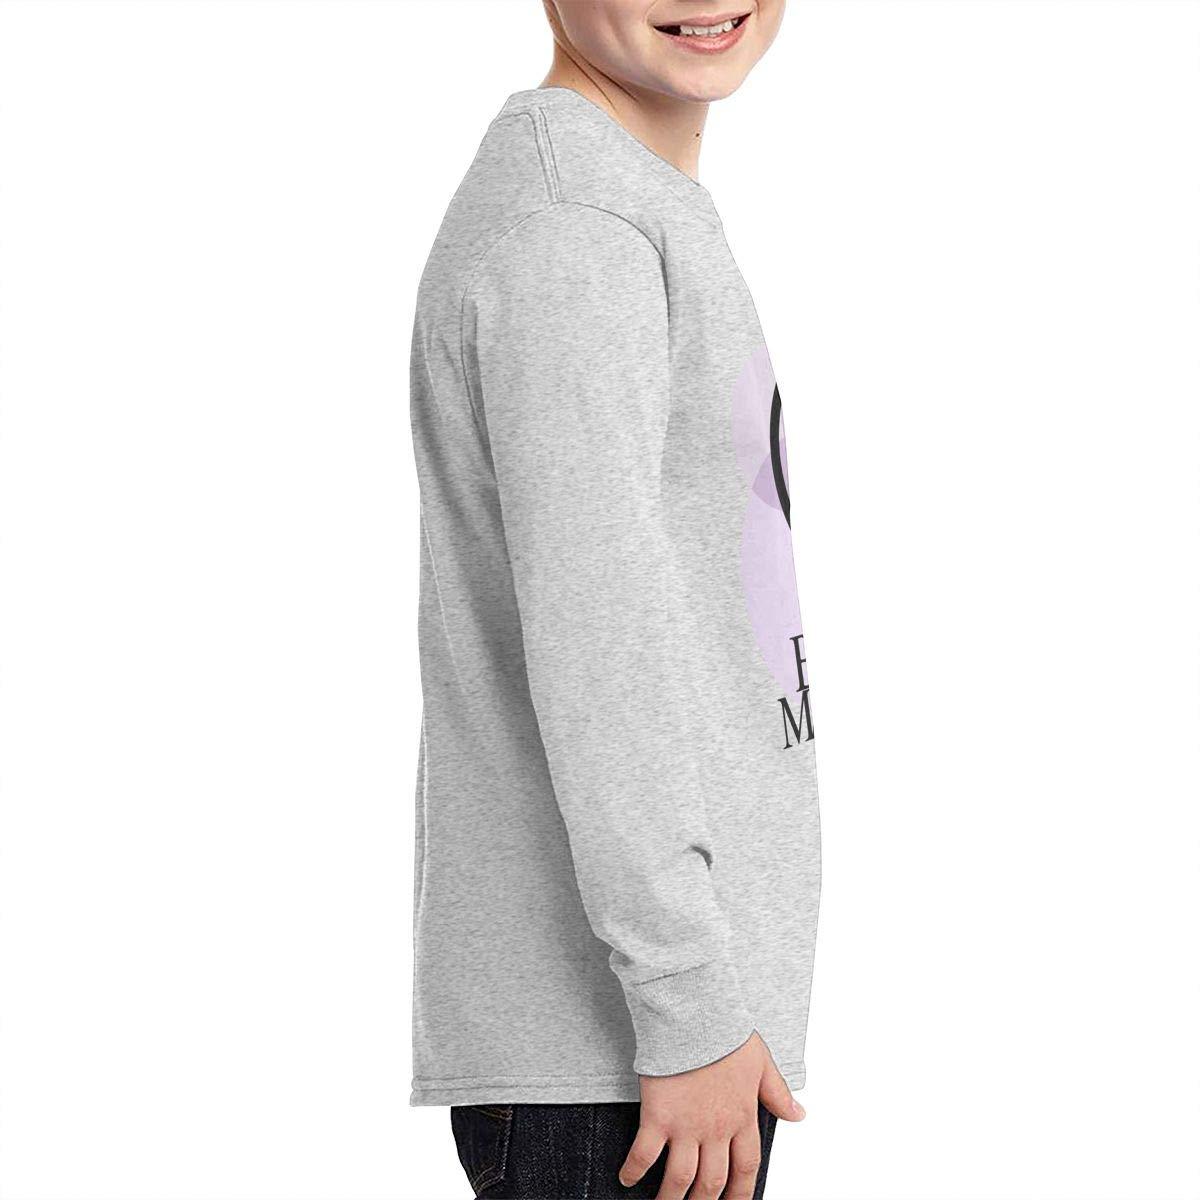 RhteGui The Birthday Massacre Boys /& Girls Junior Vintage Long Sleeve T-Shirt Black